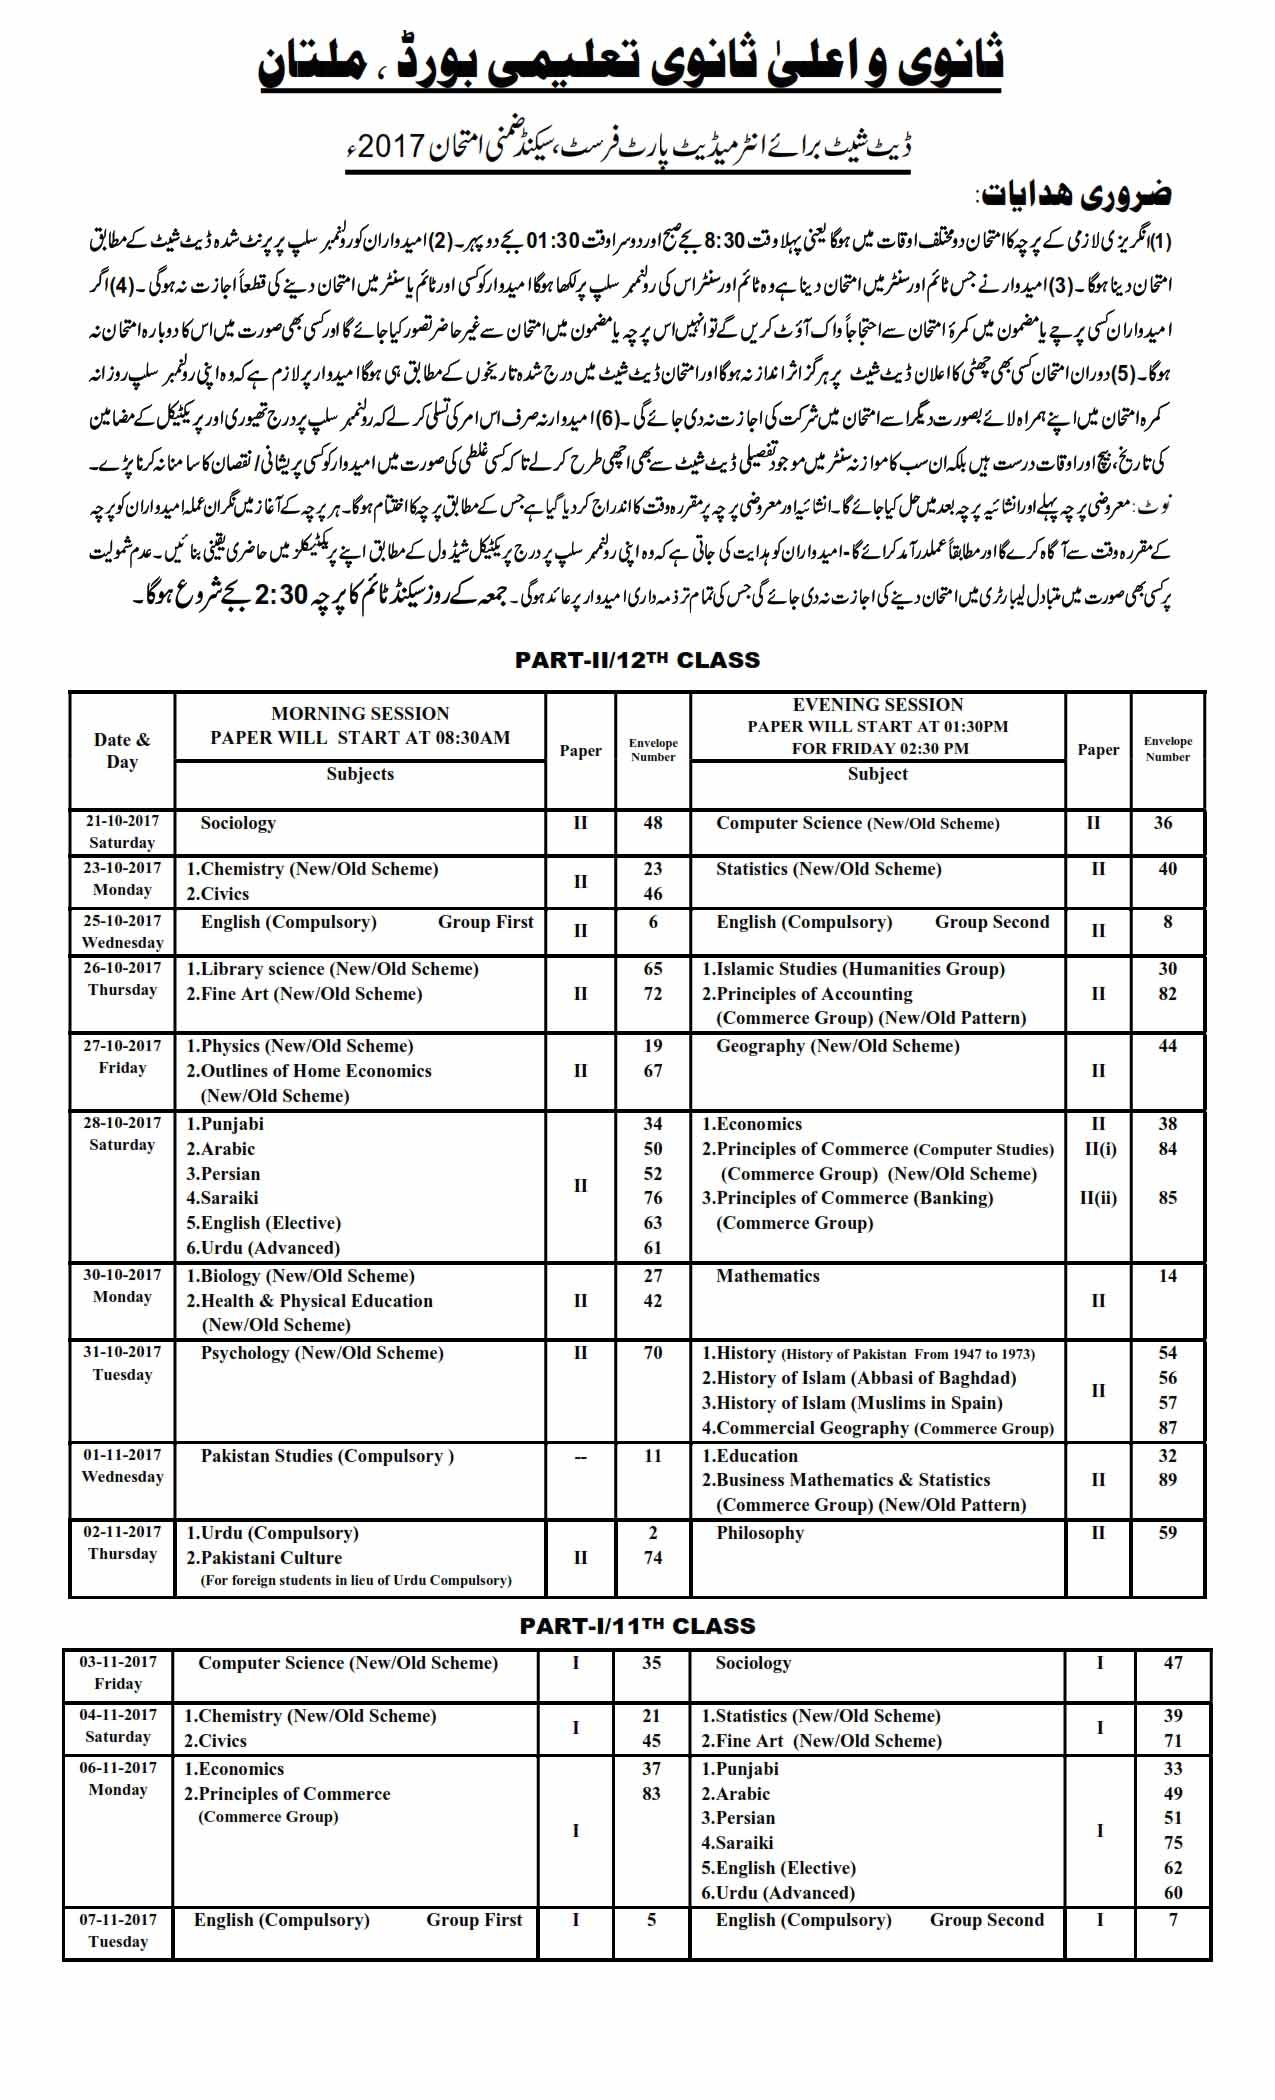 Multan Board Inter Supplementary Exams Date Sheet 2017